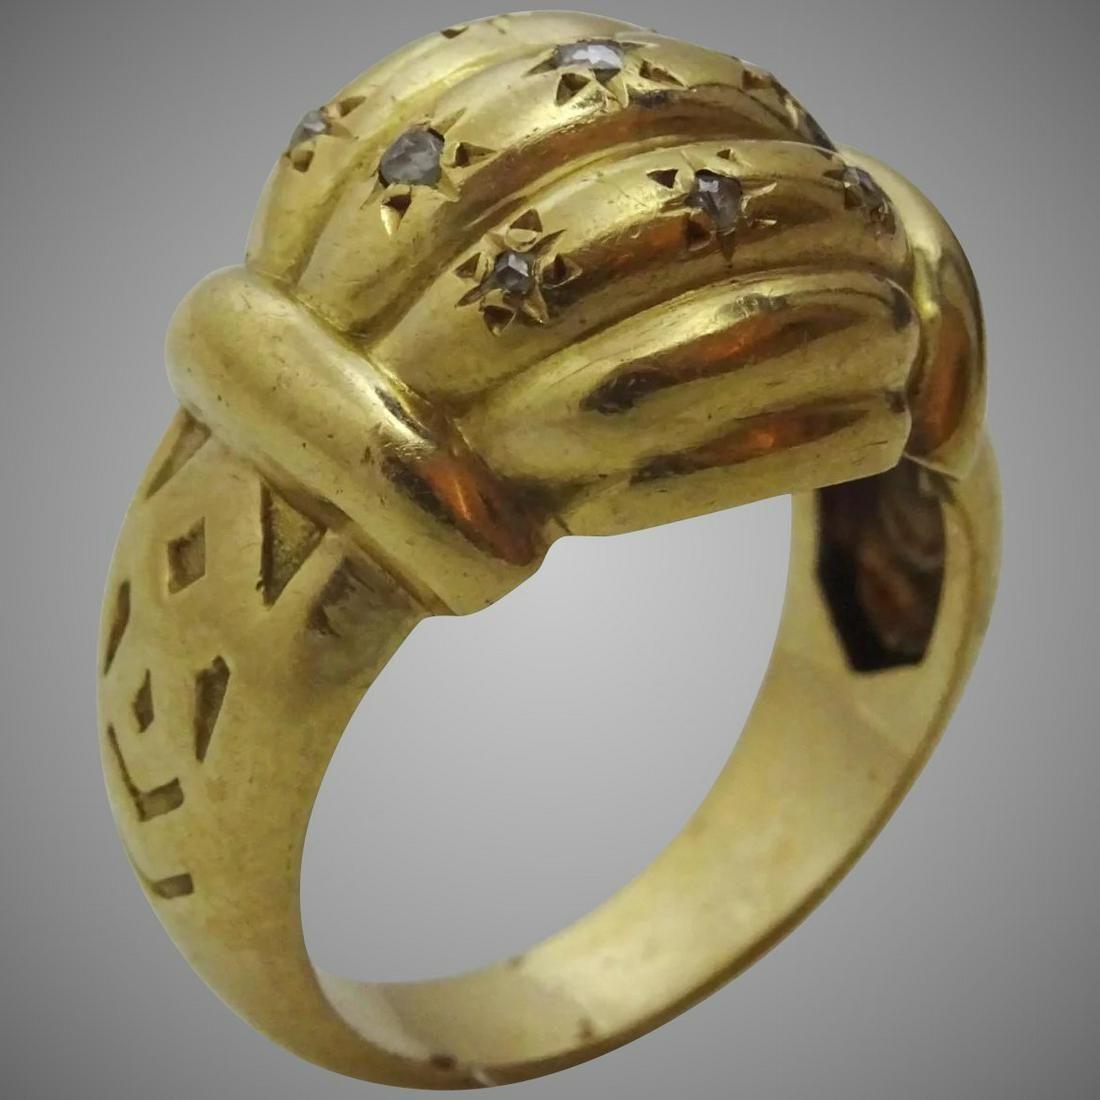 Vintage French 18 karat Gold and Diamond Ring